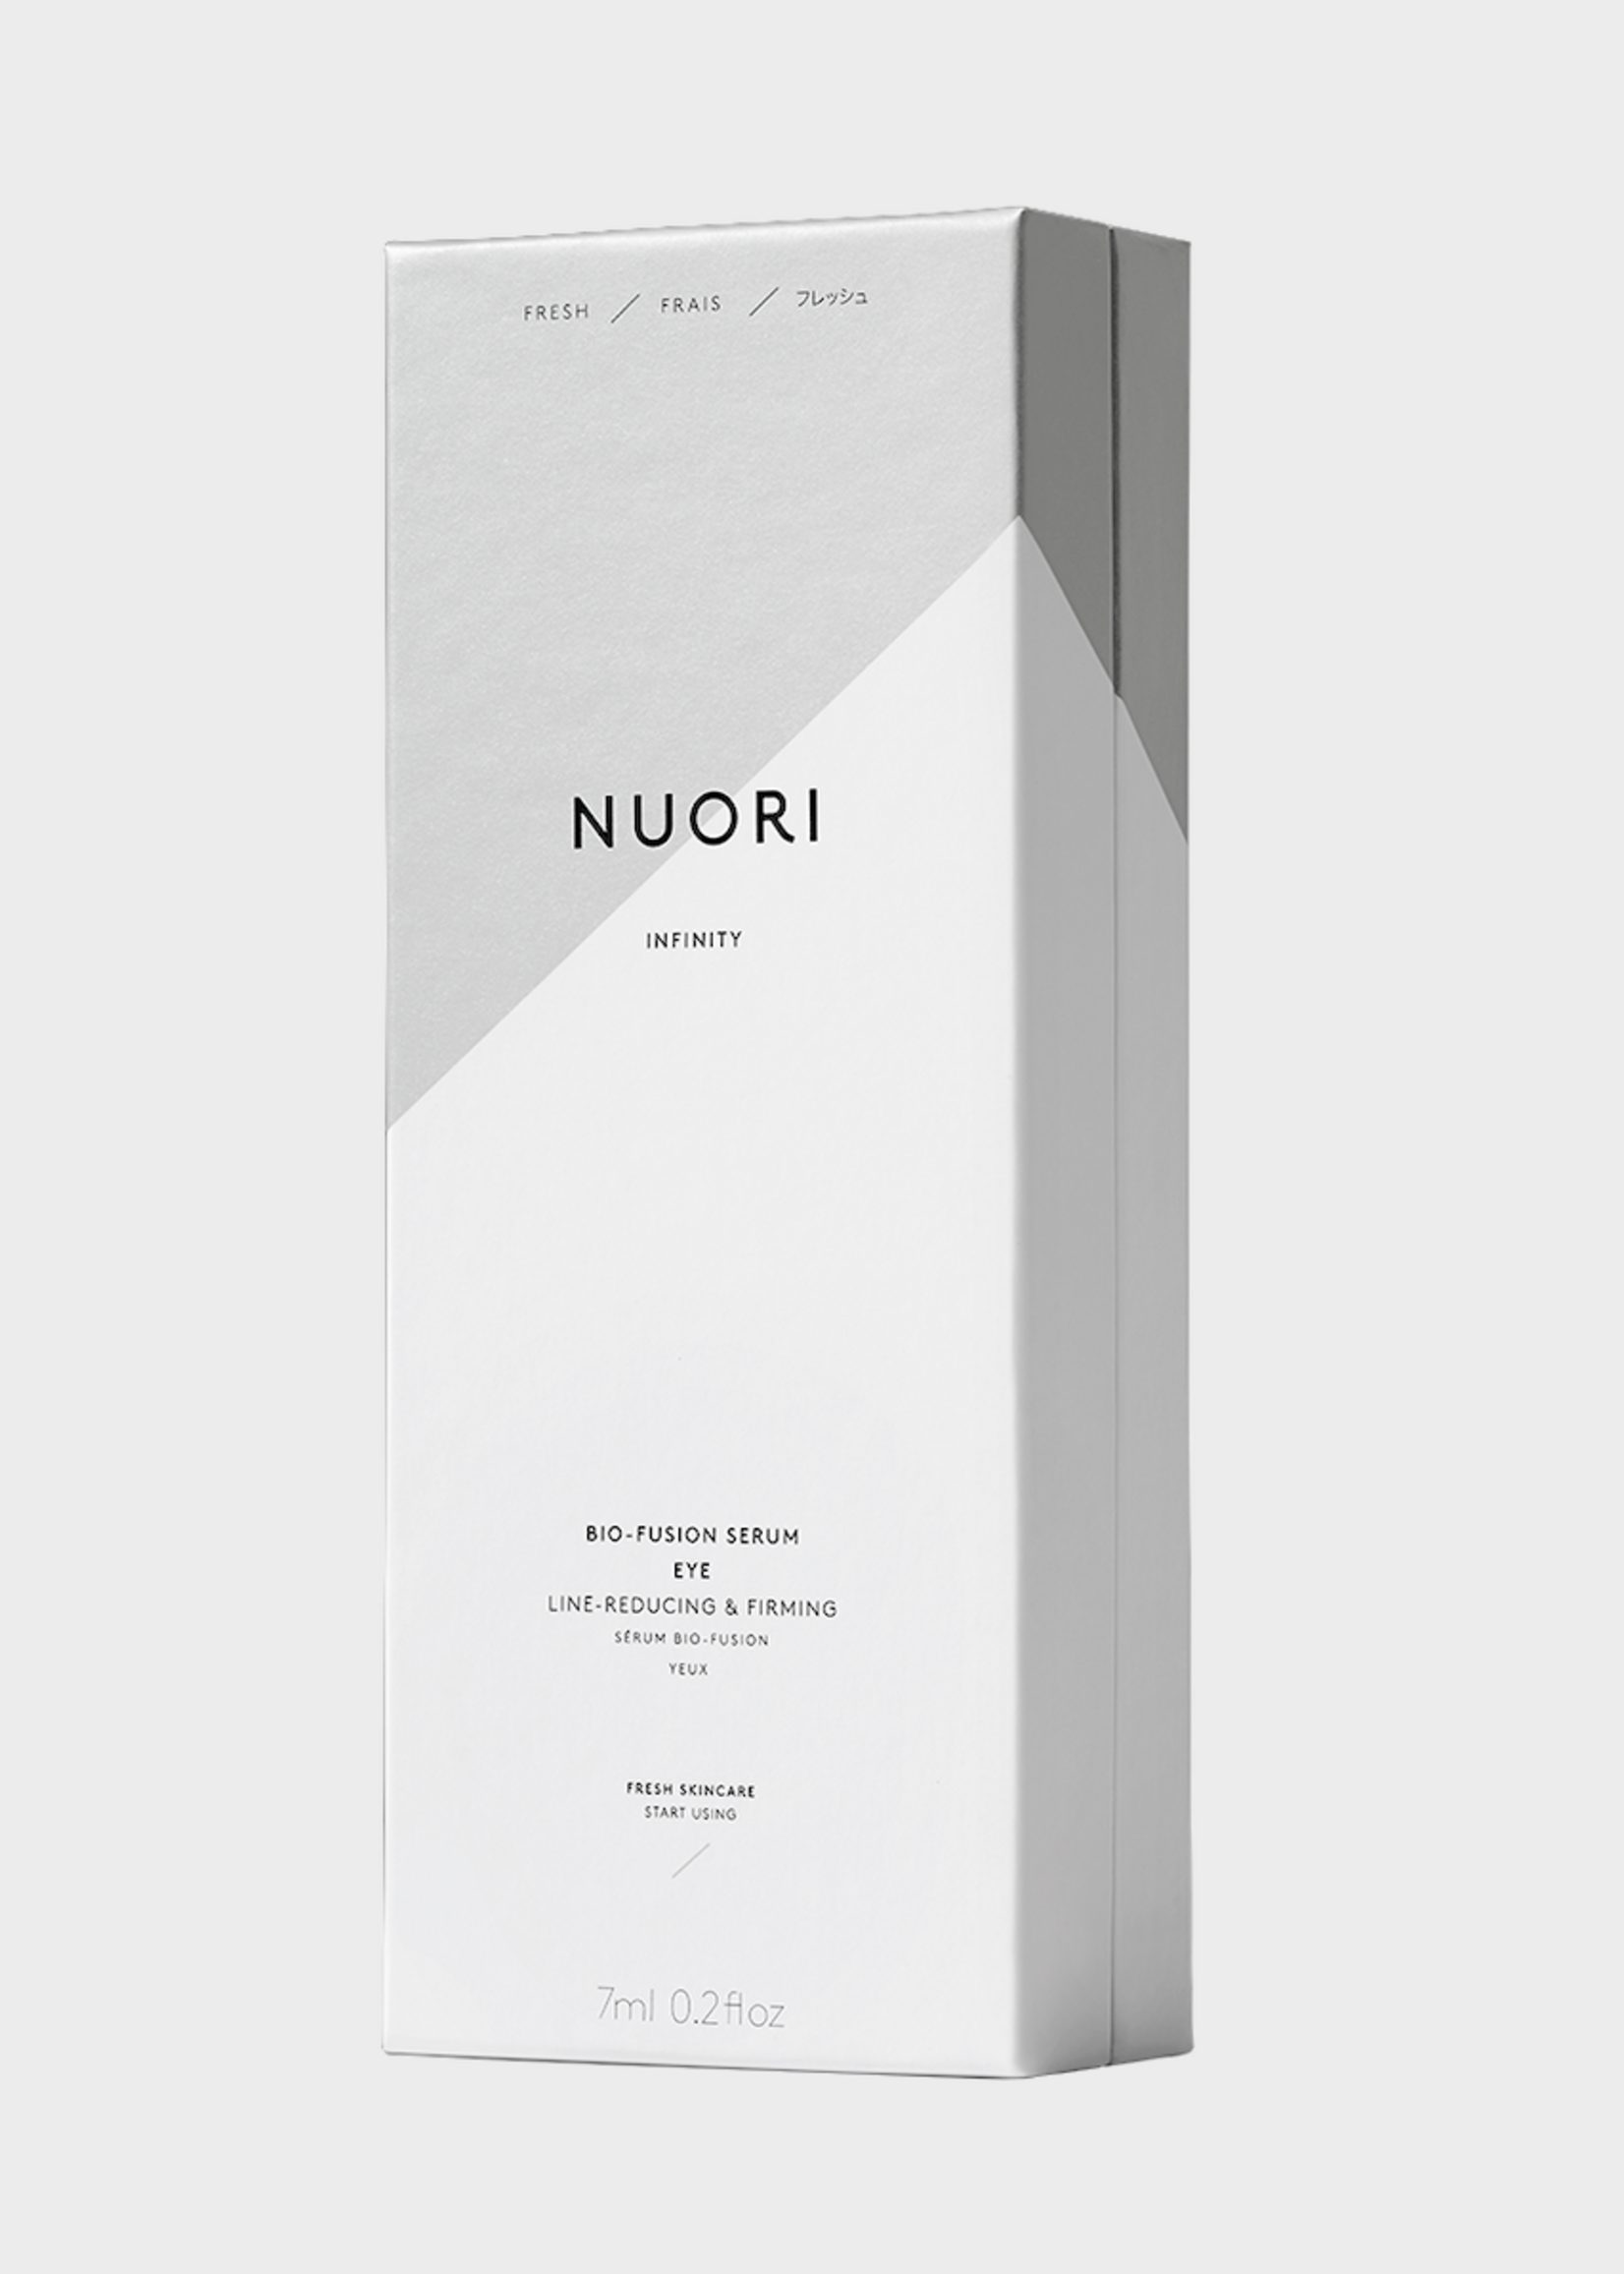 NUORI Infinity Bio-Fusion Eye Serum 7ml